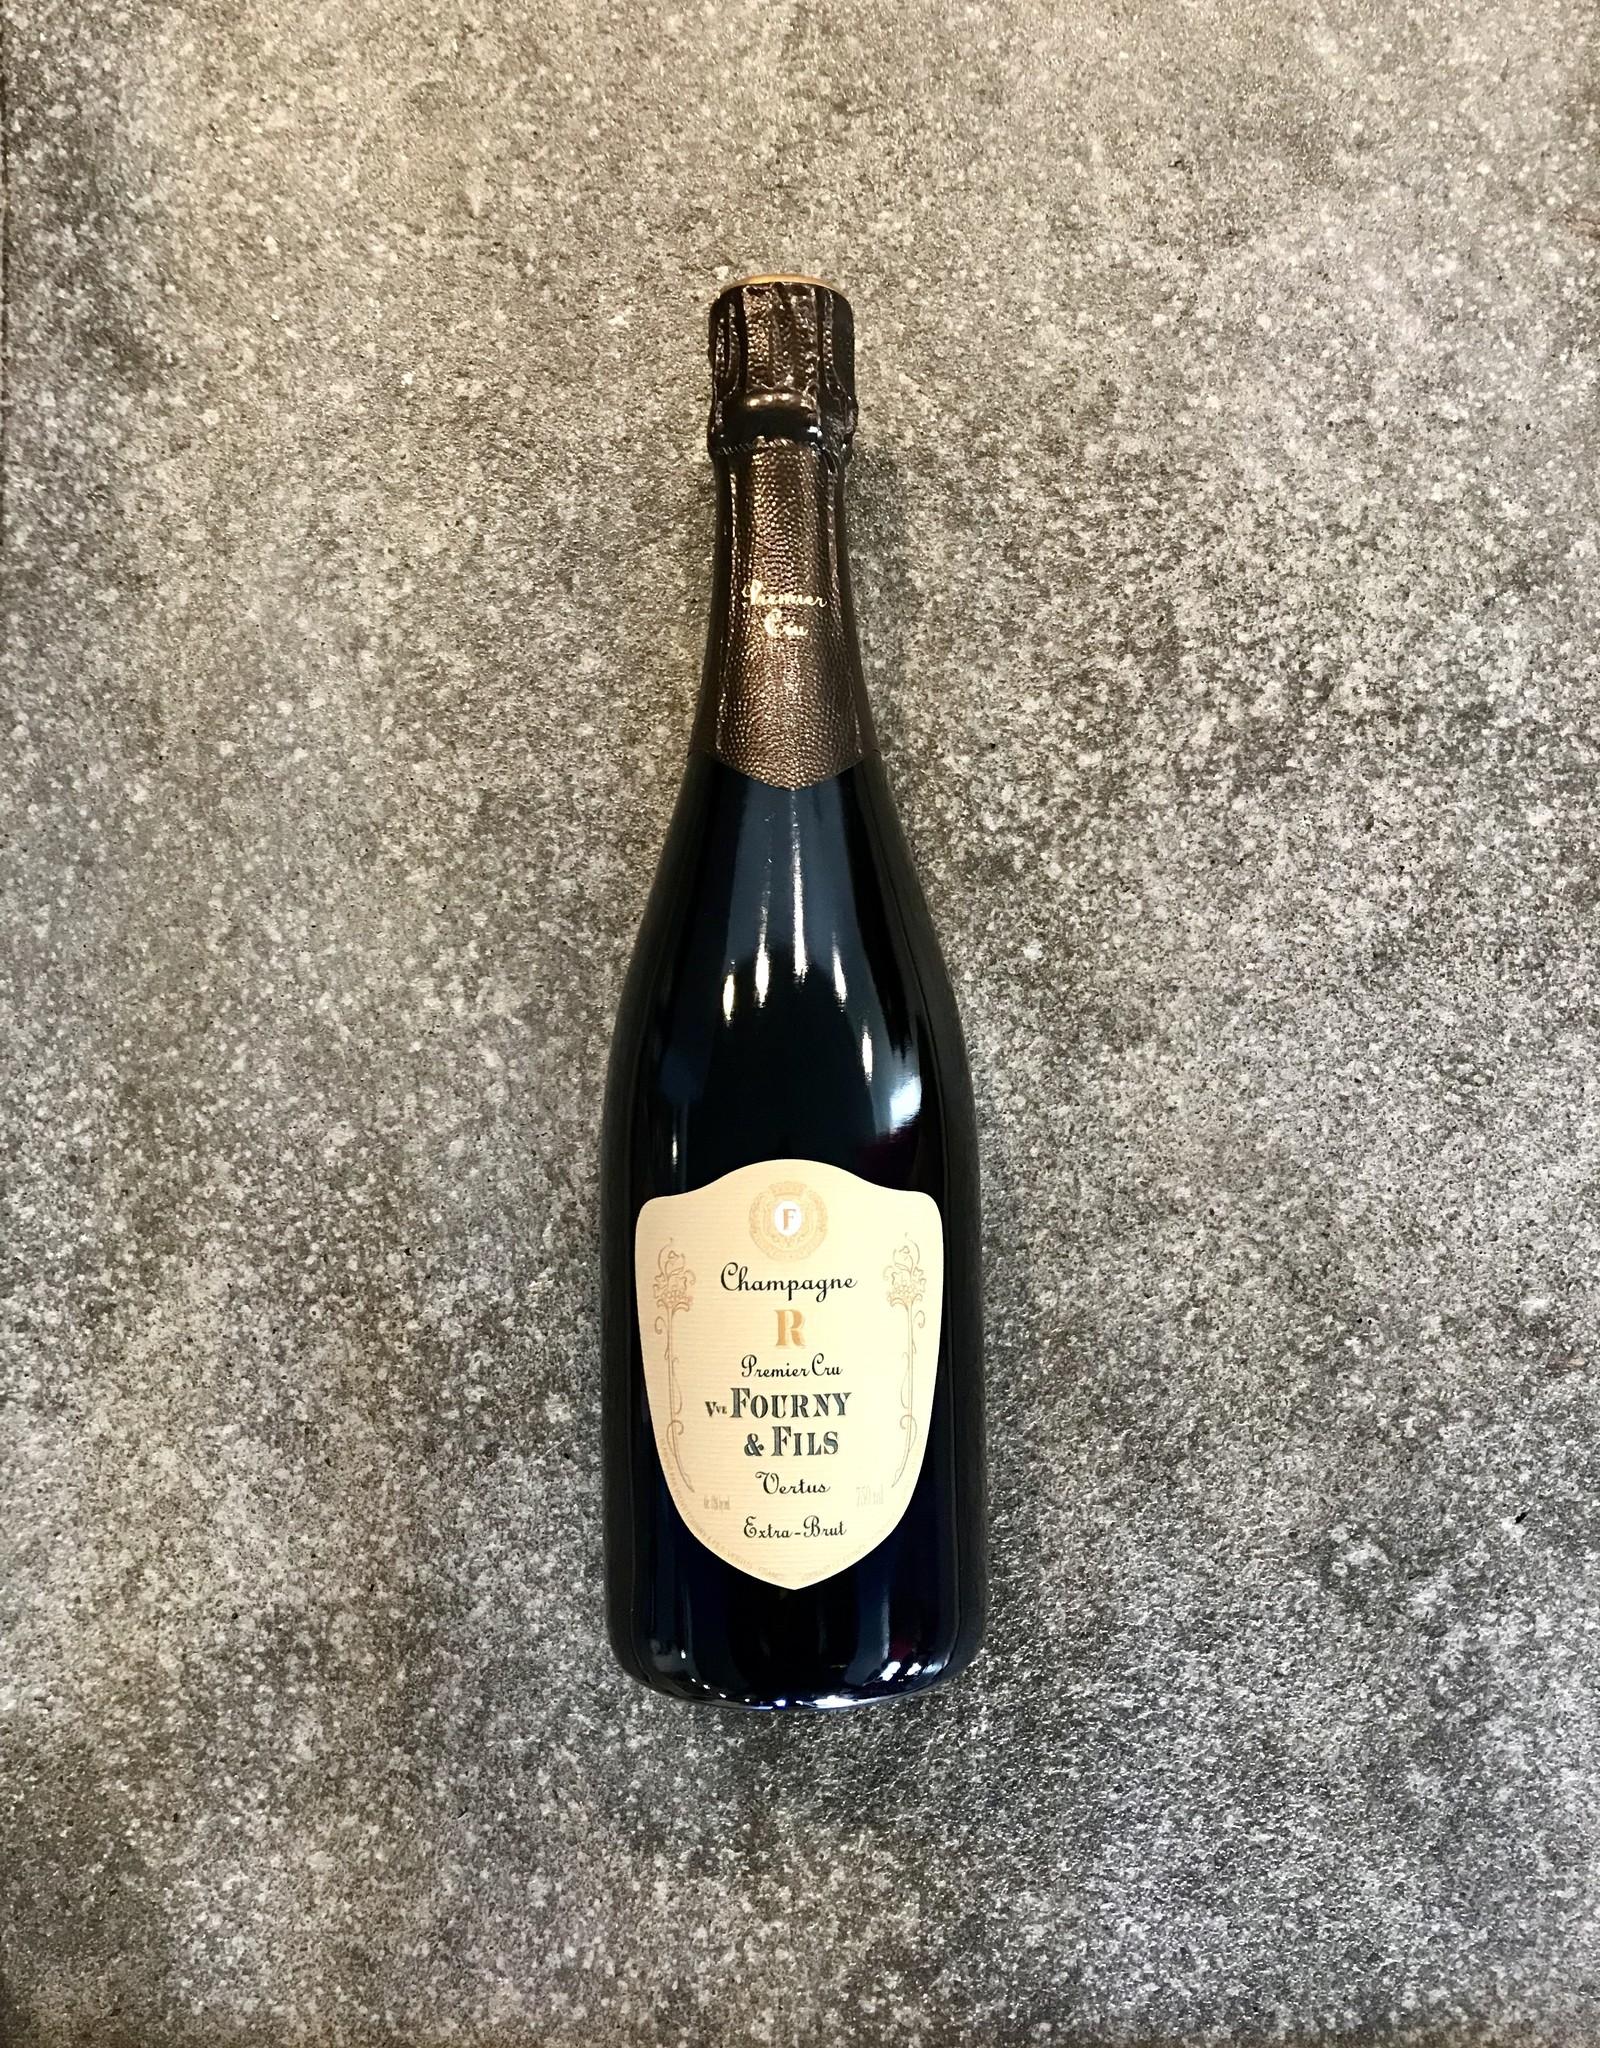 Champagne Veuve Fourny Cuvée R Extra Brut Premier Cru